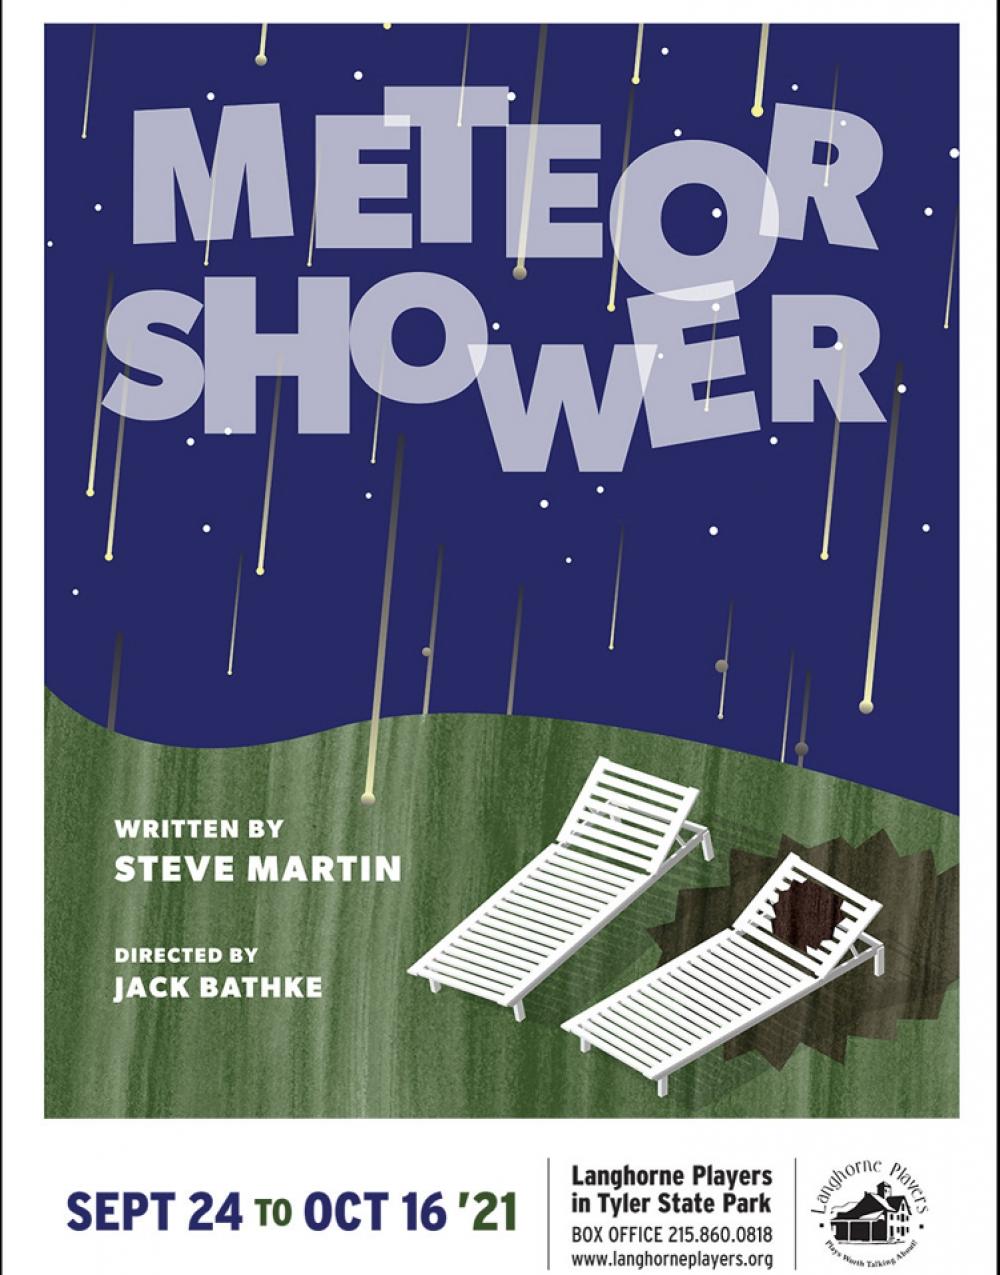 Meteor Shower at Langhorne Players